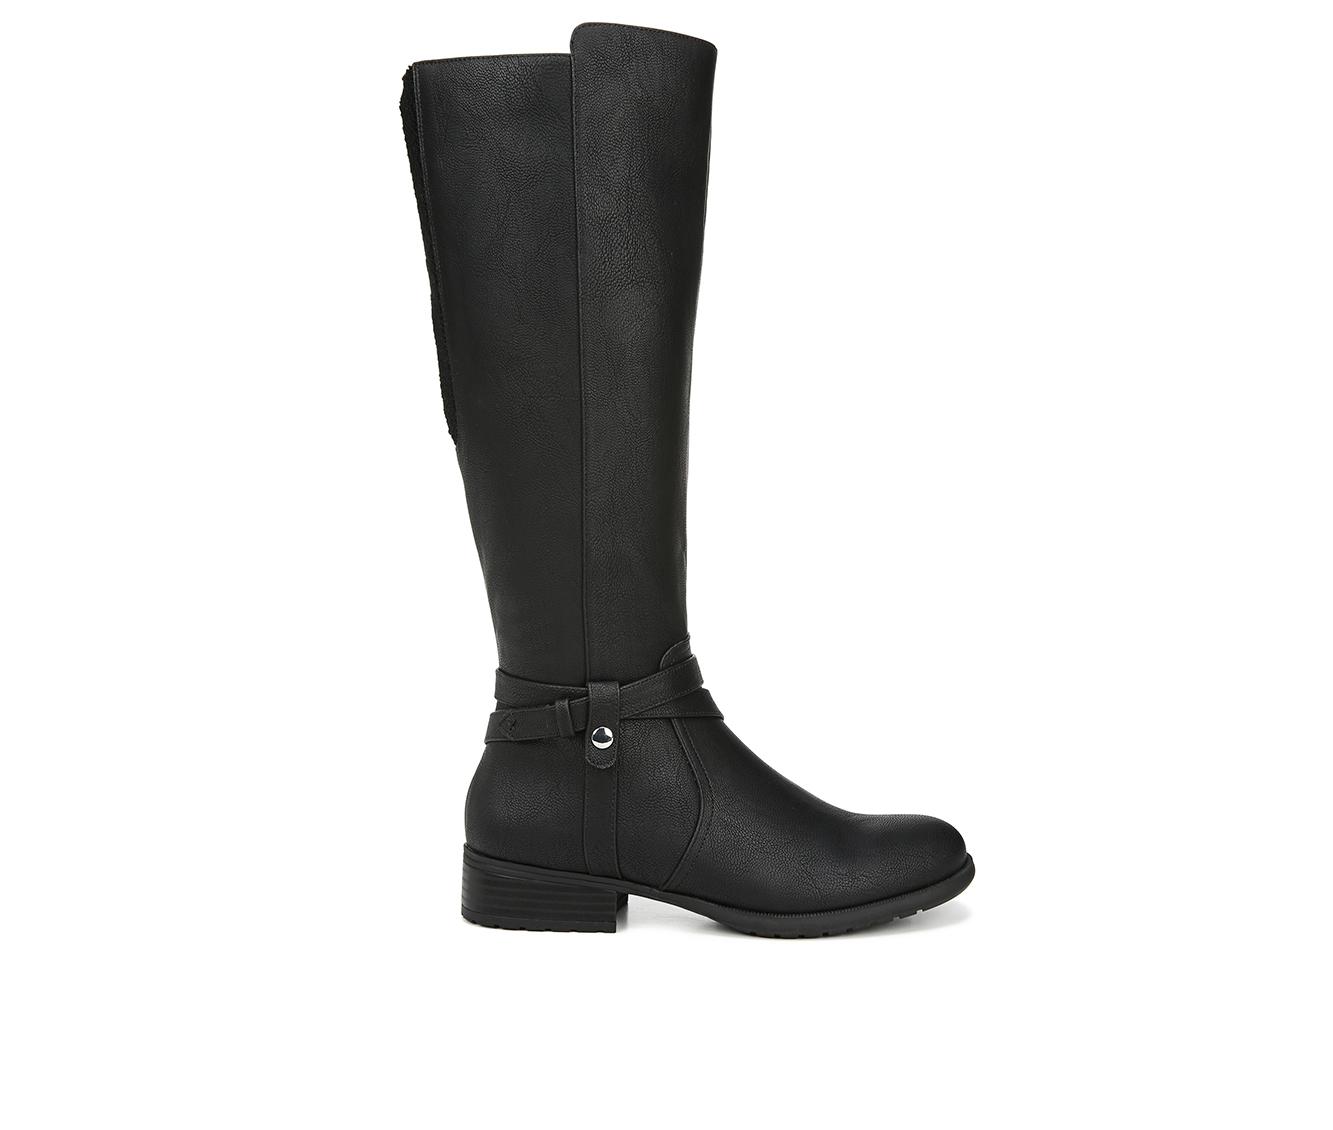 LifeStride Xtrovert Wide Calf Women's Boots (Black - Faux Leather)